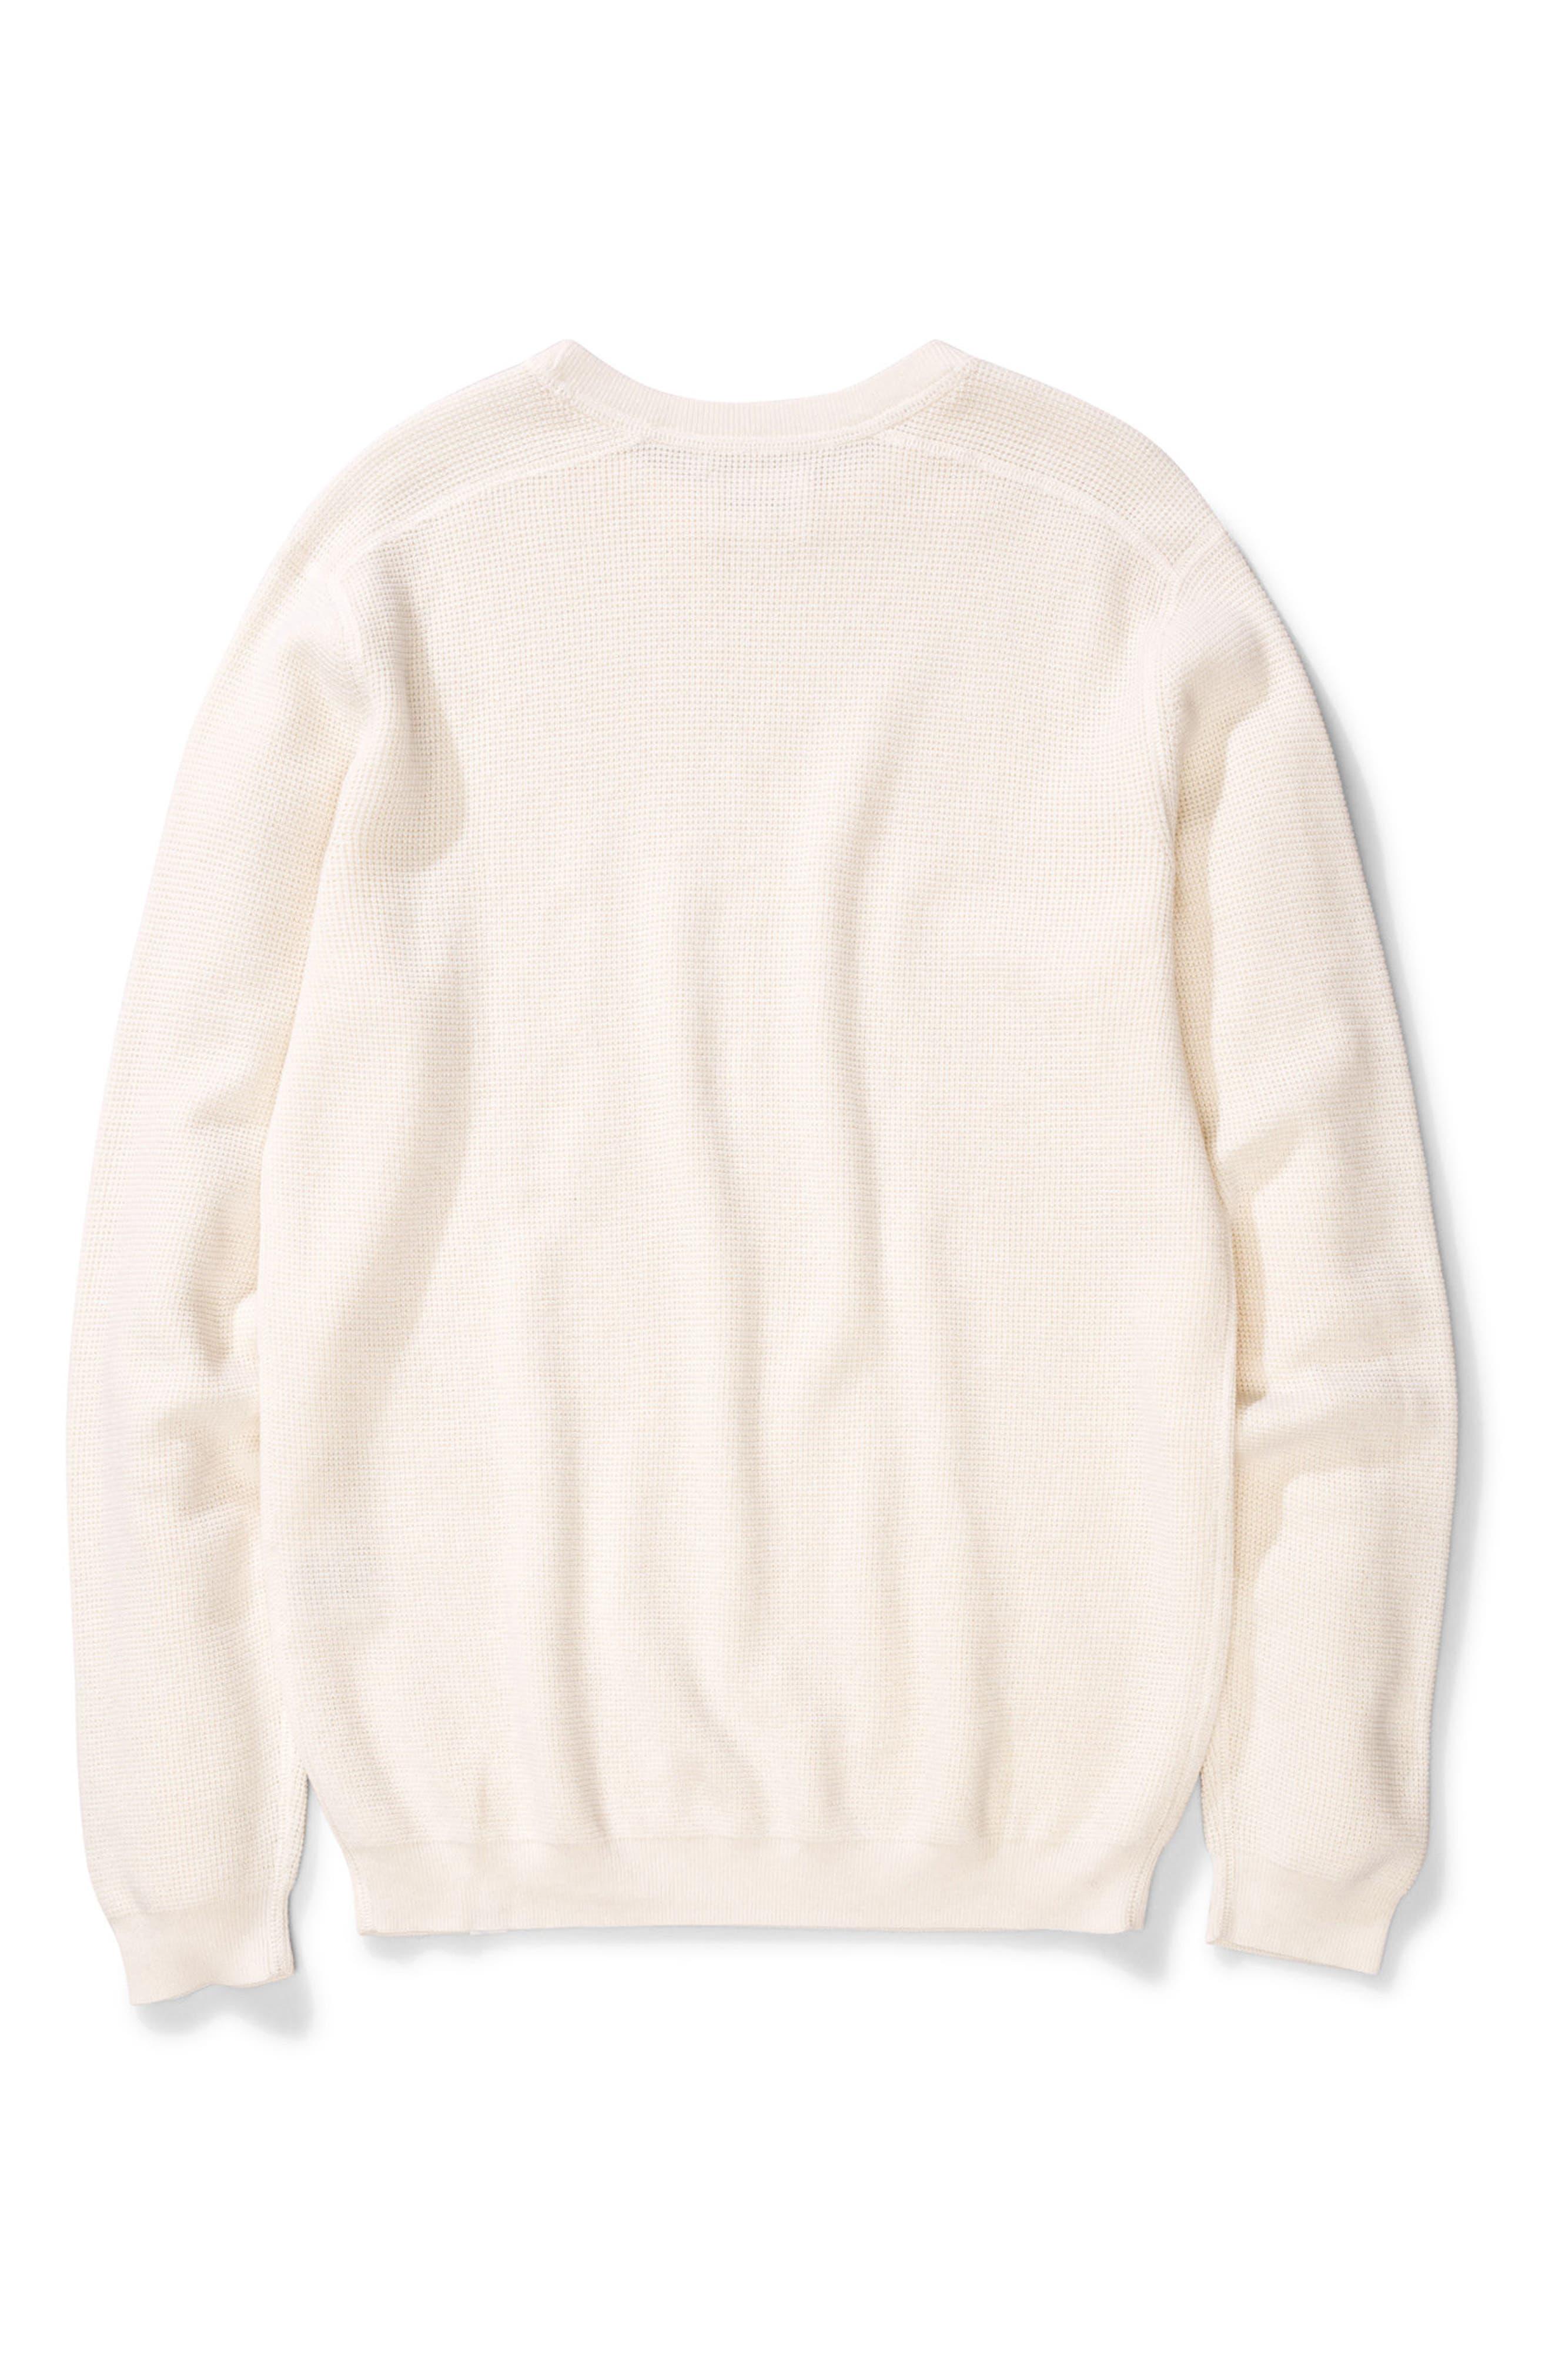 Lauge Waffle Knit Sweatshirt,                         Main,                         color, 101